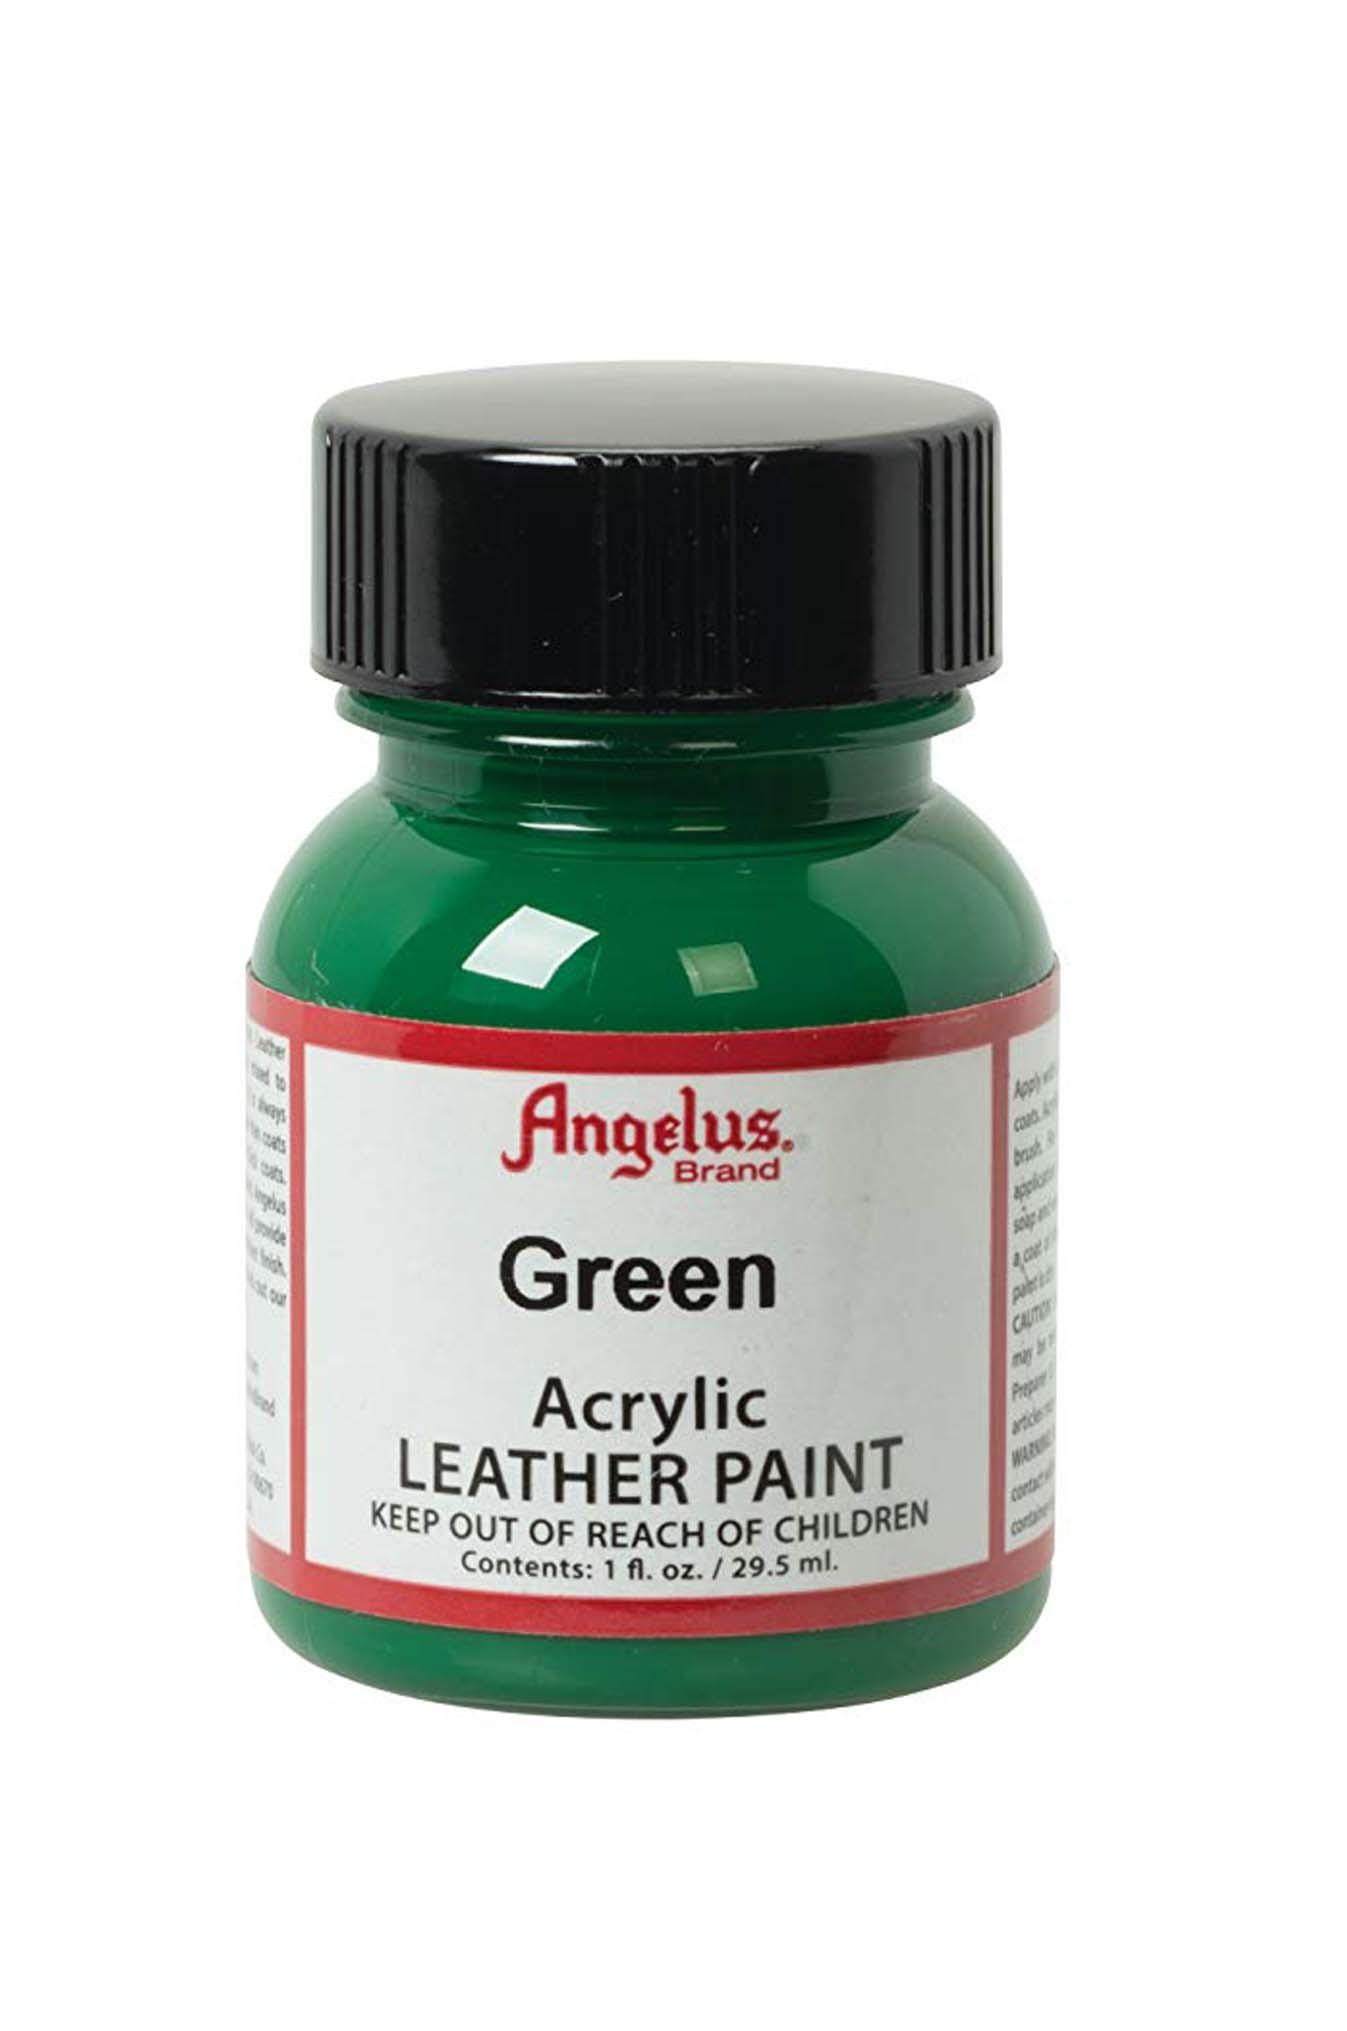 Angelus Acrylic Leather Paint: Green